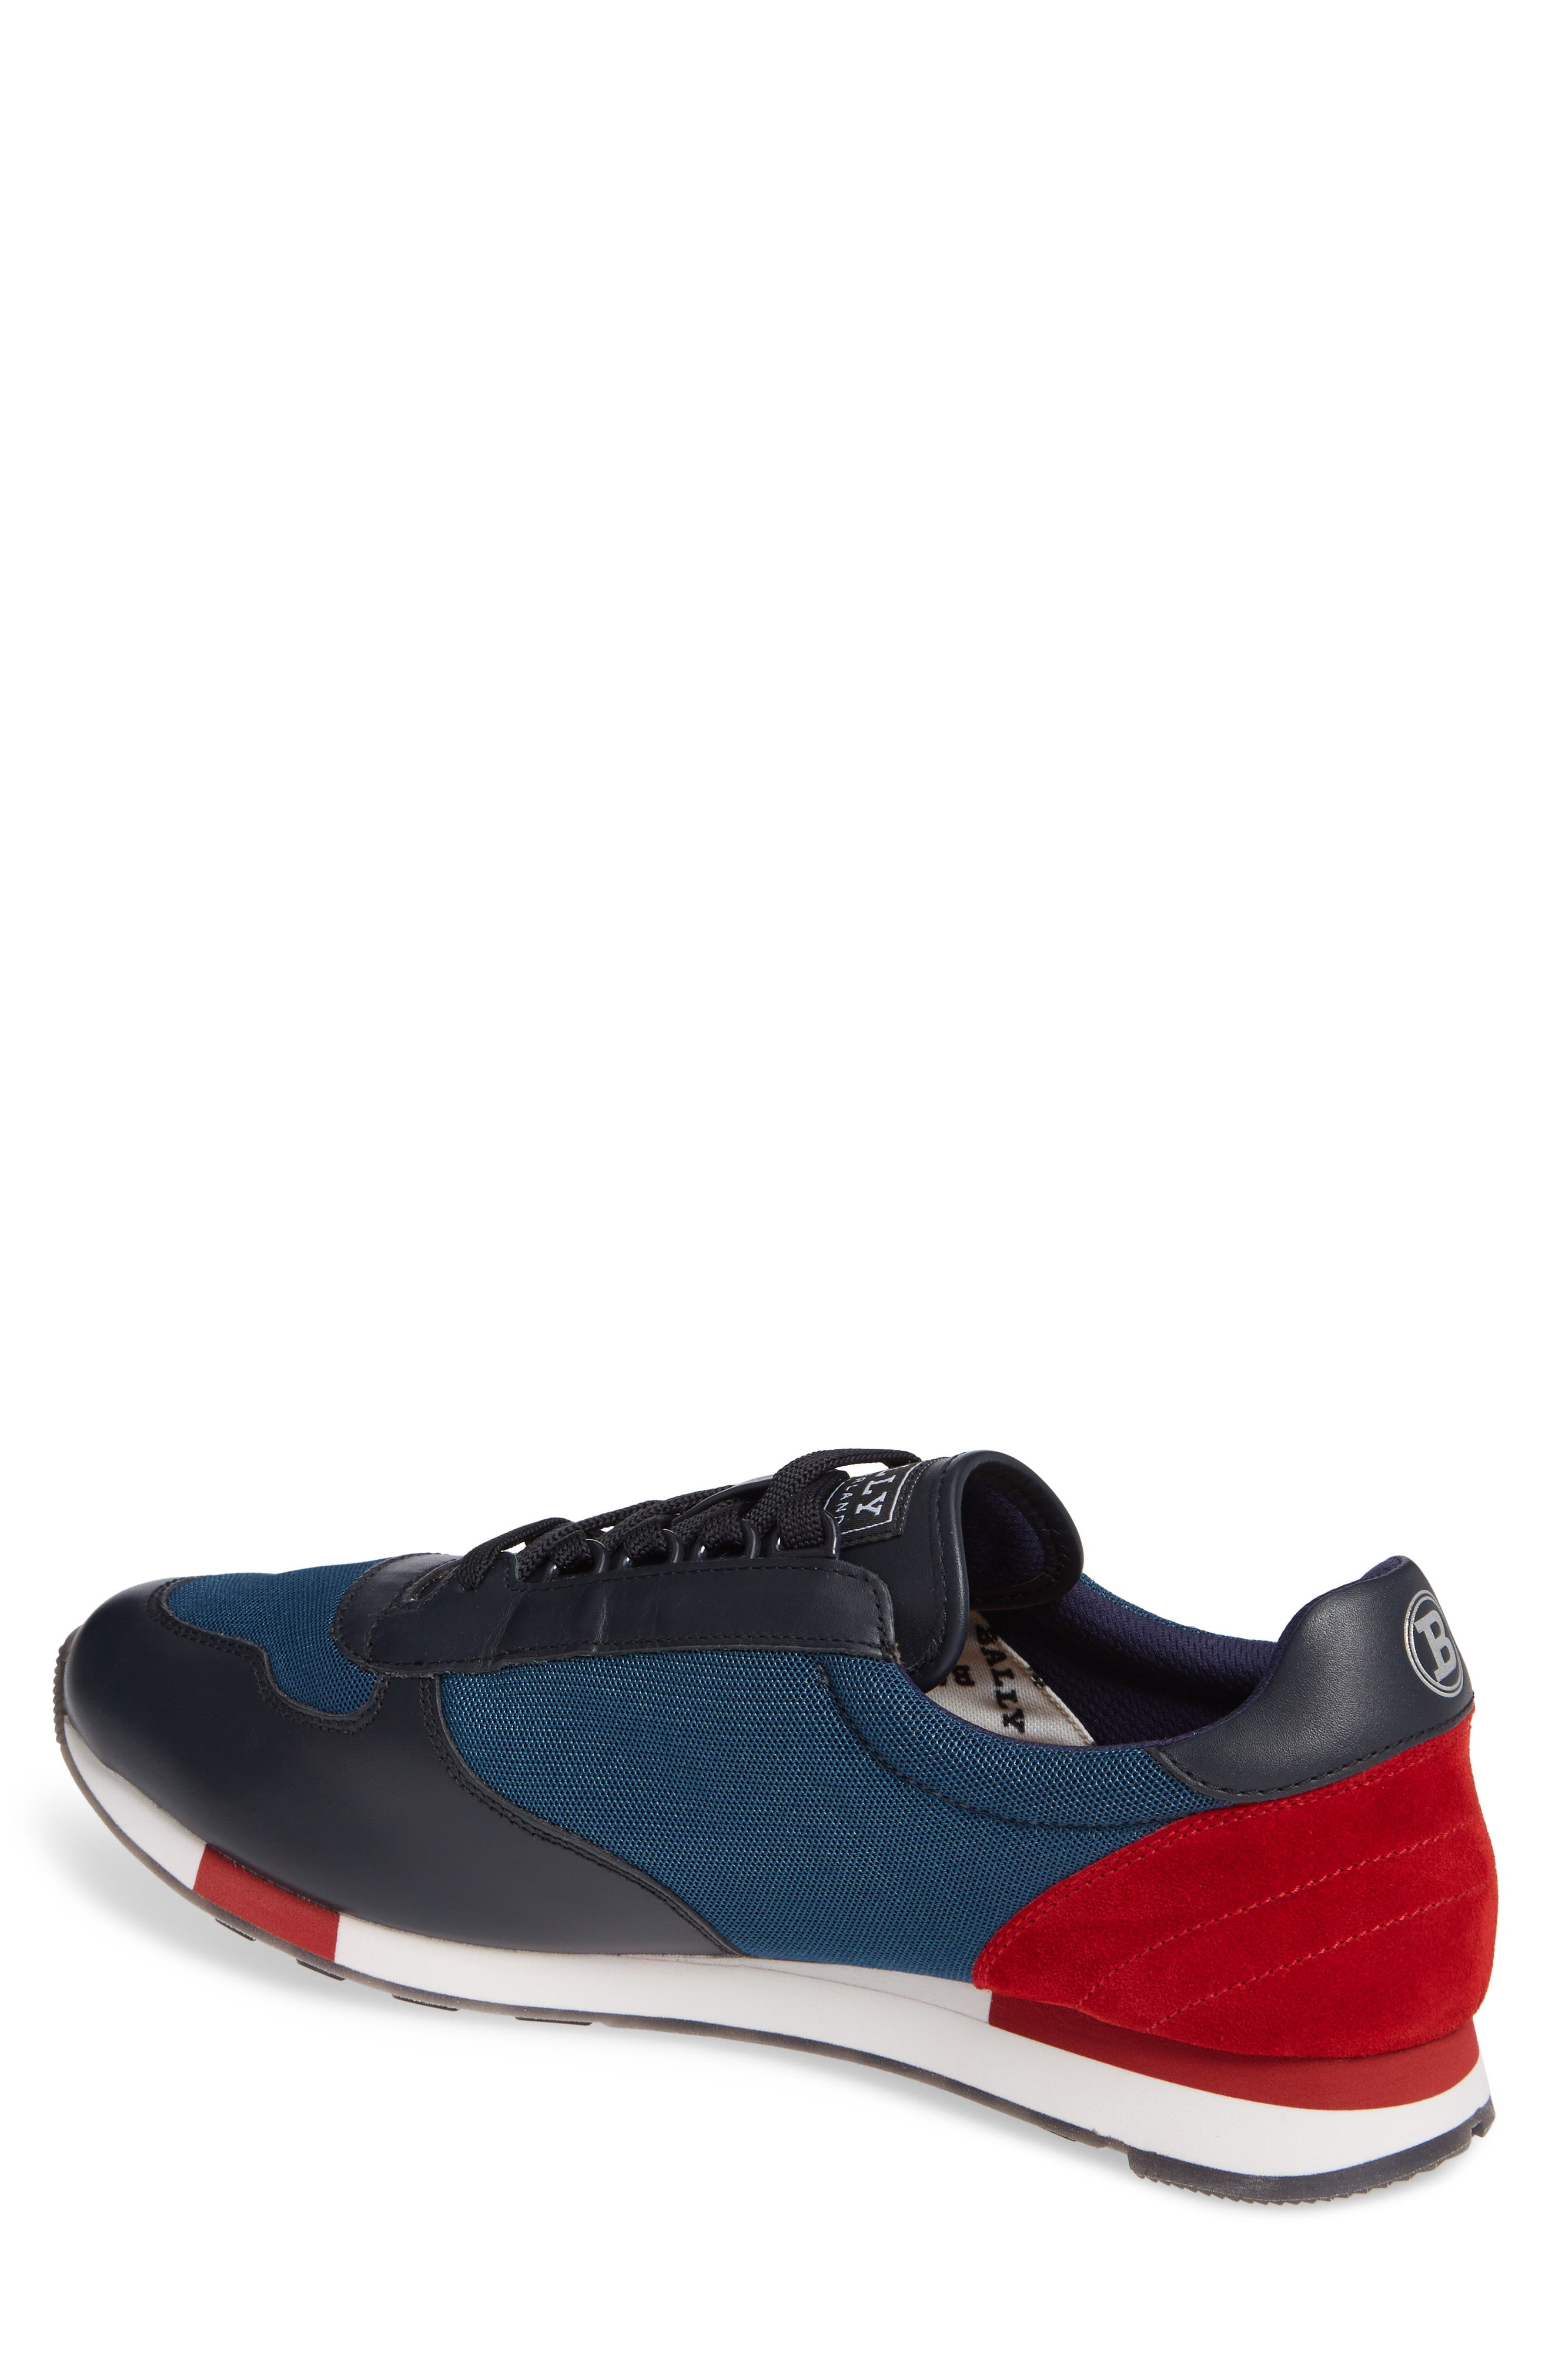 Gavino Low Top Sneaker,                             Alternate thumbnail 2, color,                             Blue